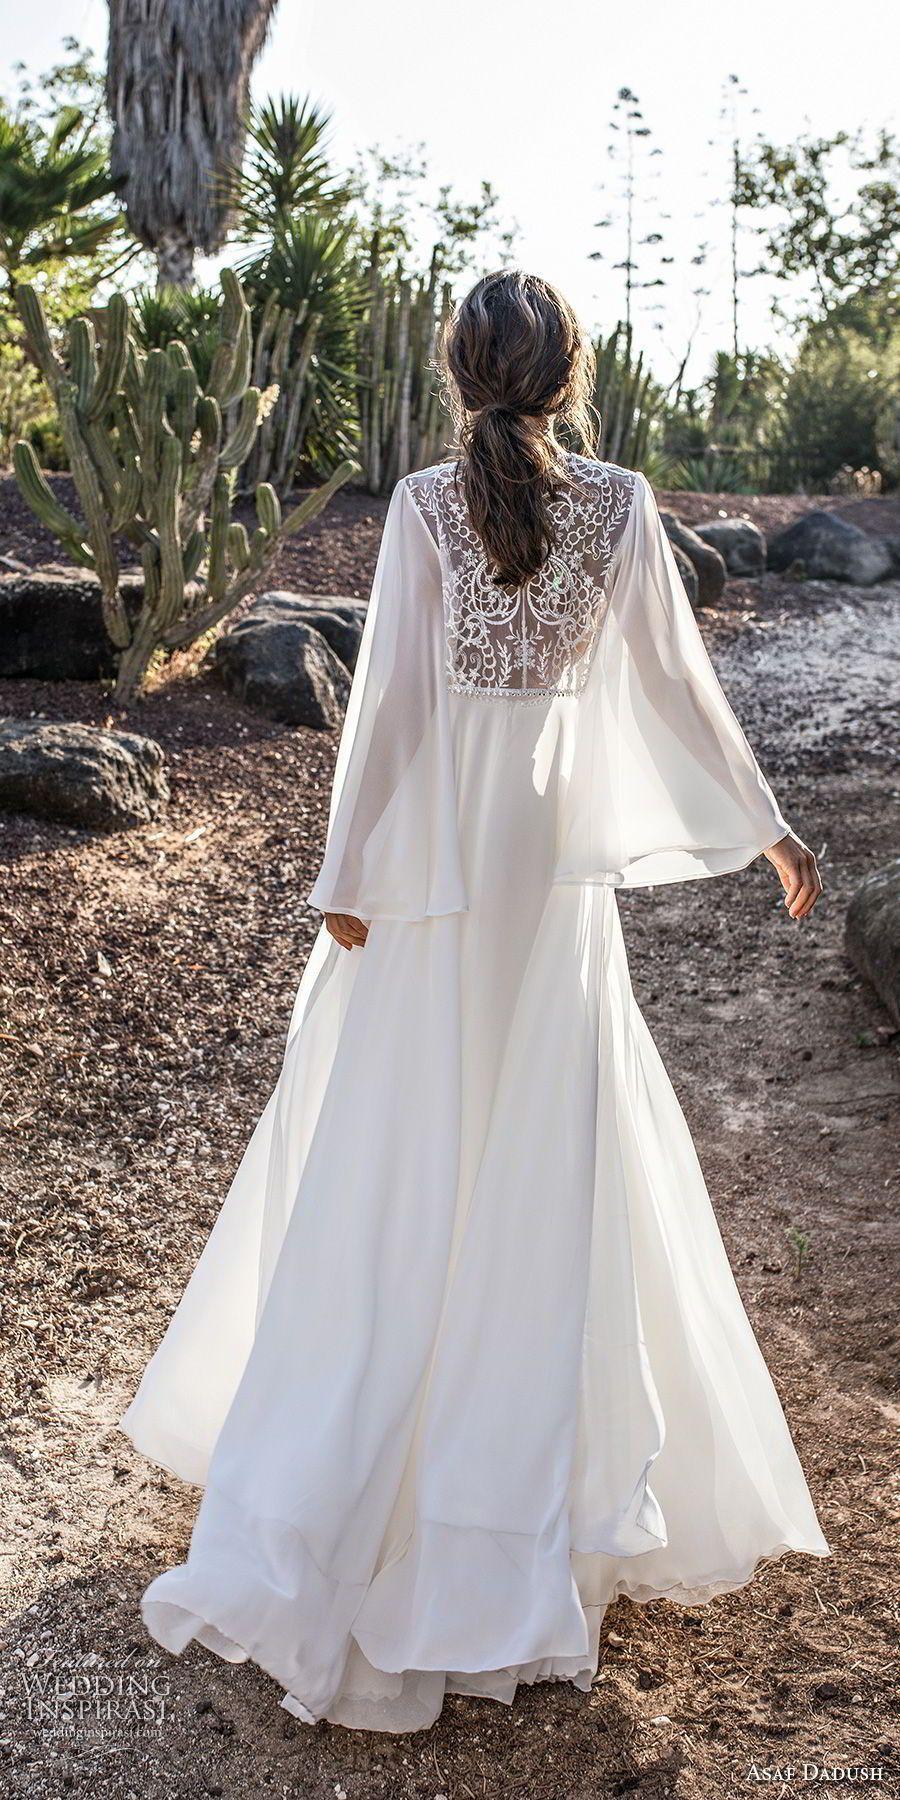 Asaf dadush bridal long sleeves deep plunging sweetheart